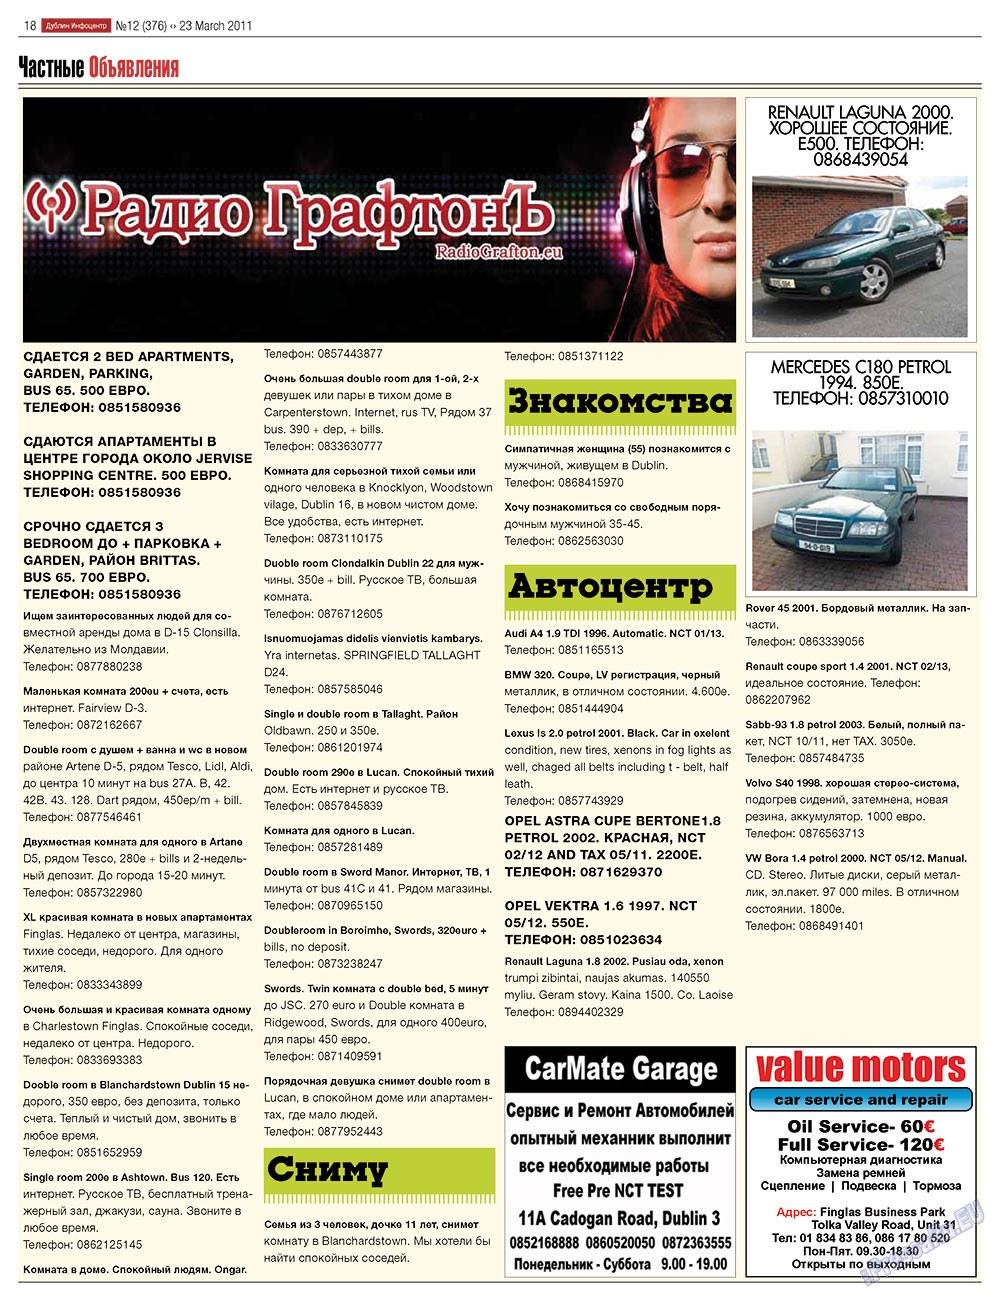 Дублин инфоцентр (газета). 2011 год, номер 12, стр. 18